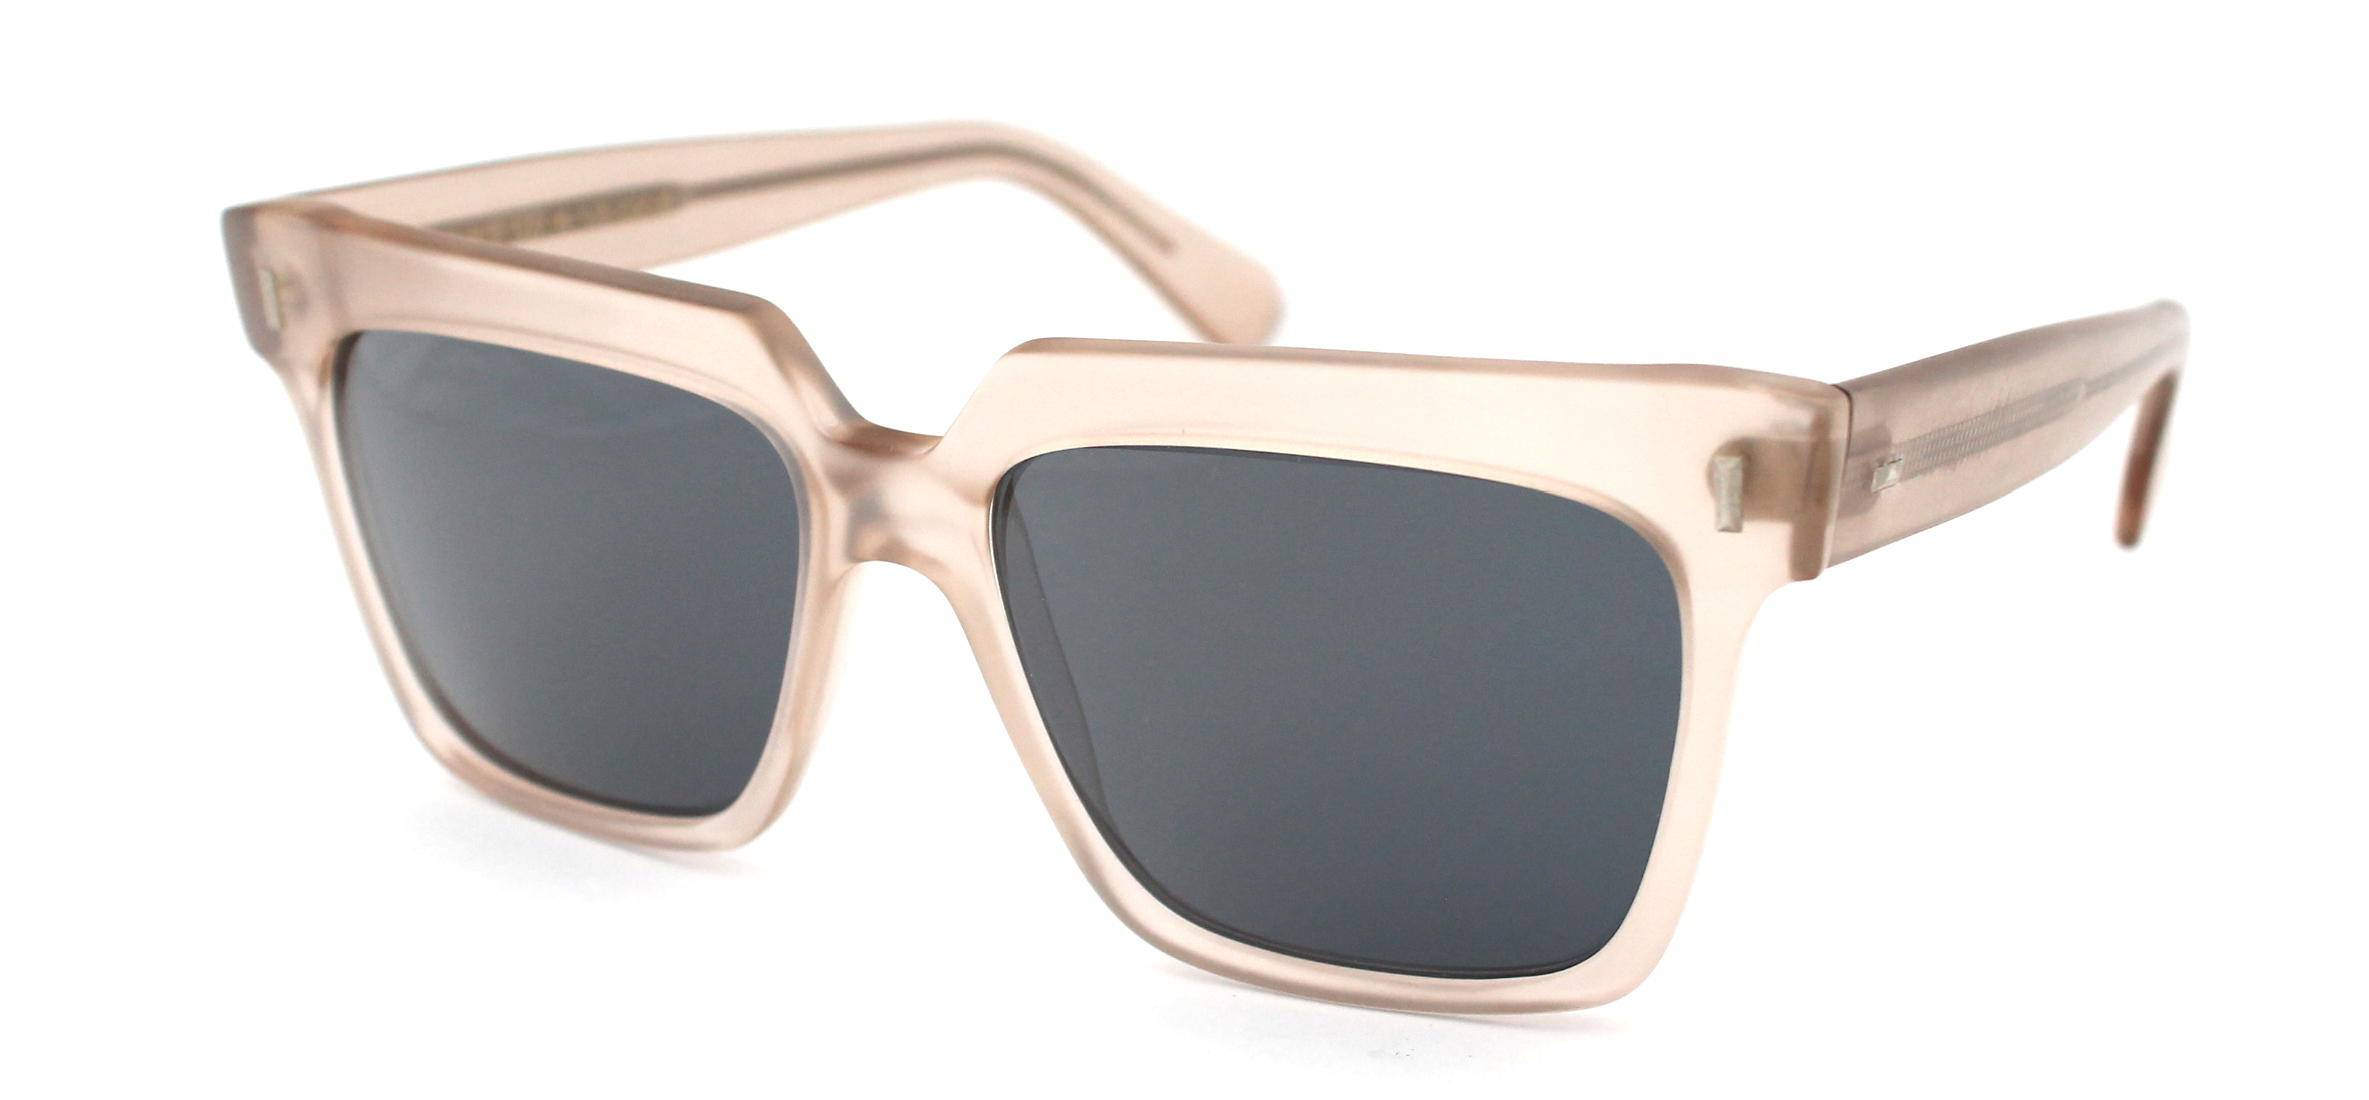 Paulino Spectacles - Branca 200B